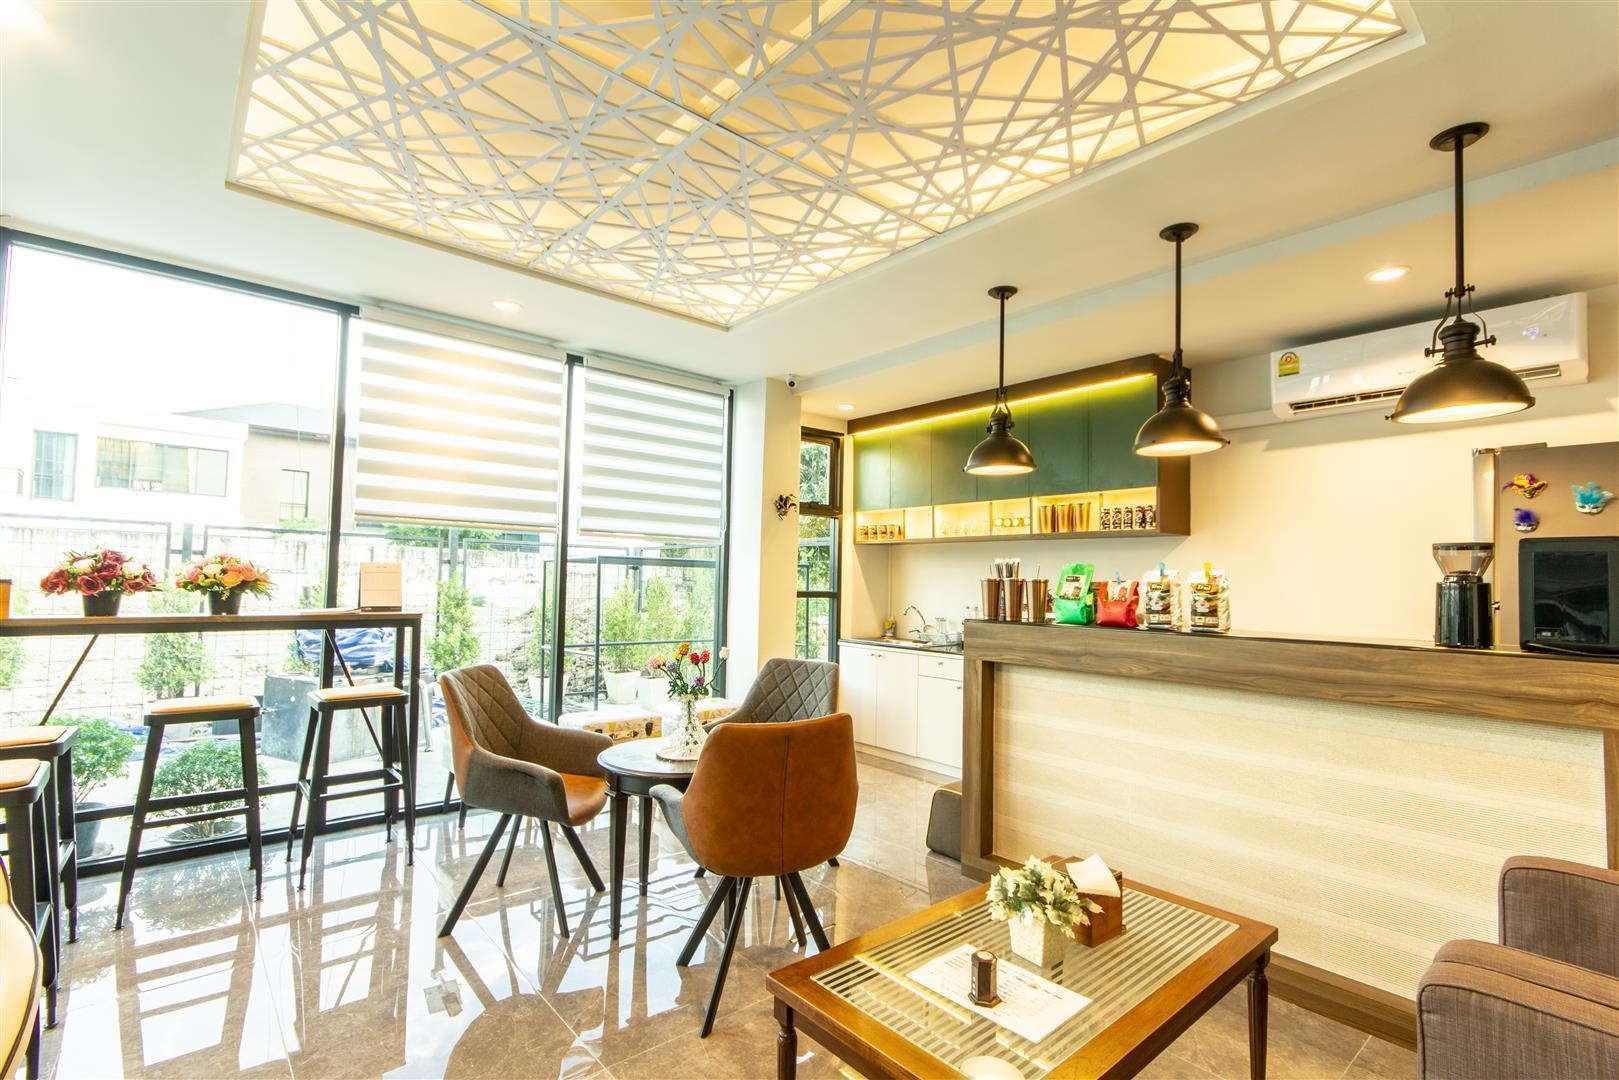 Plearnwan Deluxe Newroom WiFi near Lat Phrao MRT สตูดิโอ อพาร์ตเมนต์ 1 ห้องน้ำส่วนตัว ขนาด 24 ตร.ม. – รัชดาภิเษก